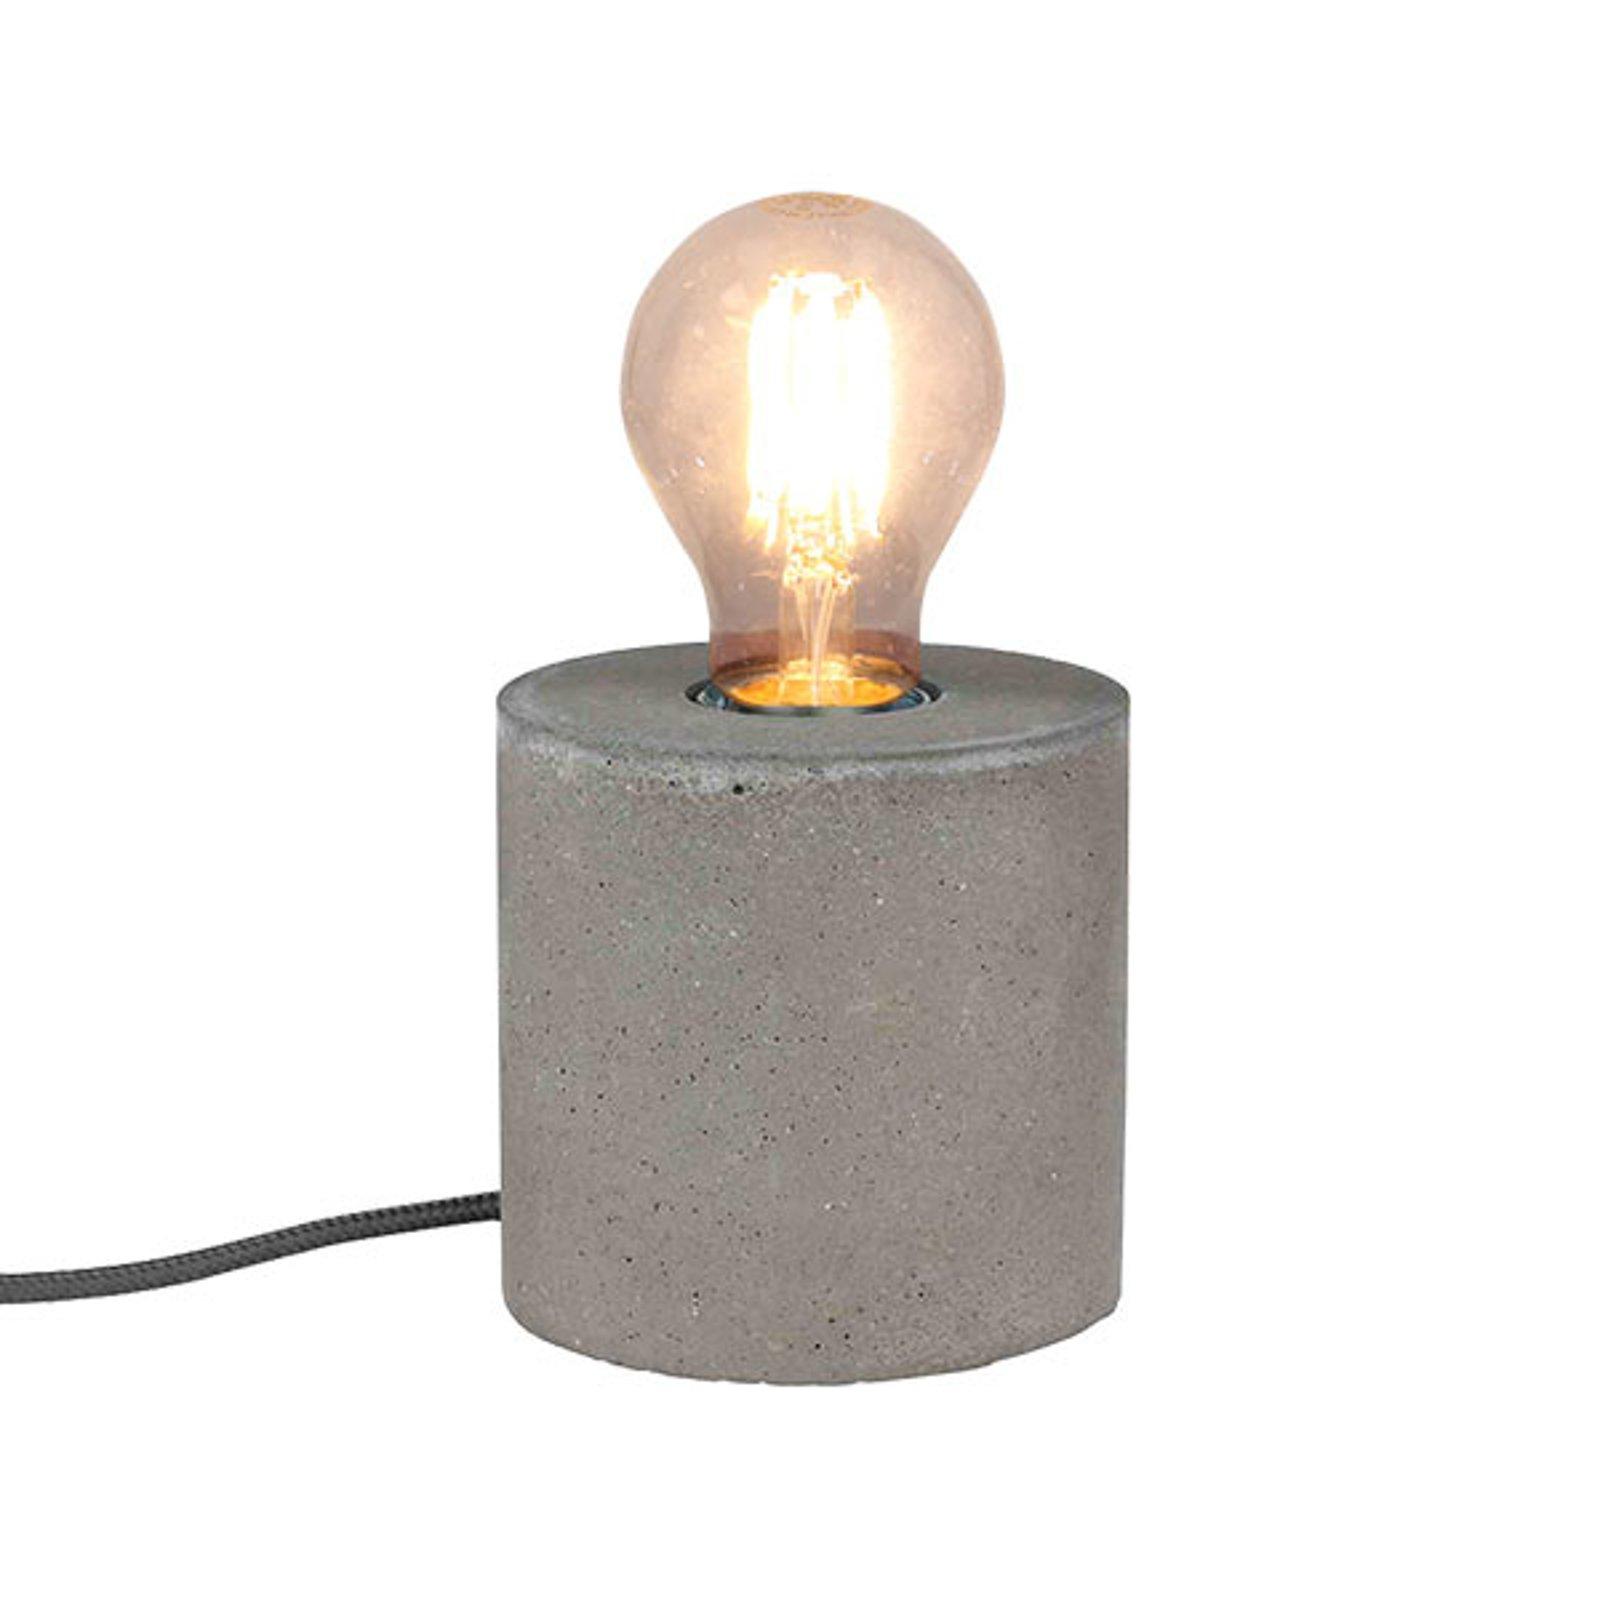 Strong - betong-bordlampe i rund form